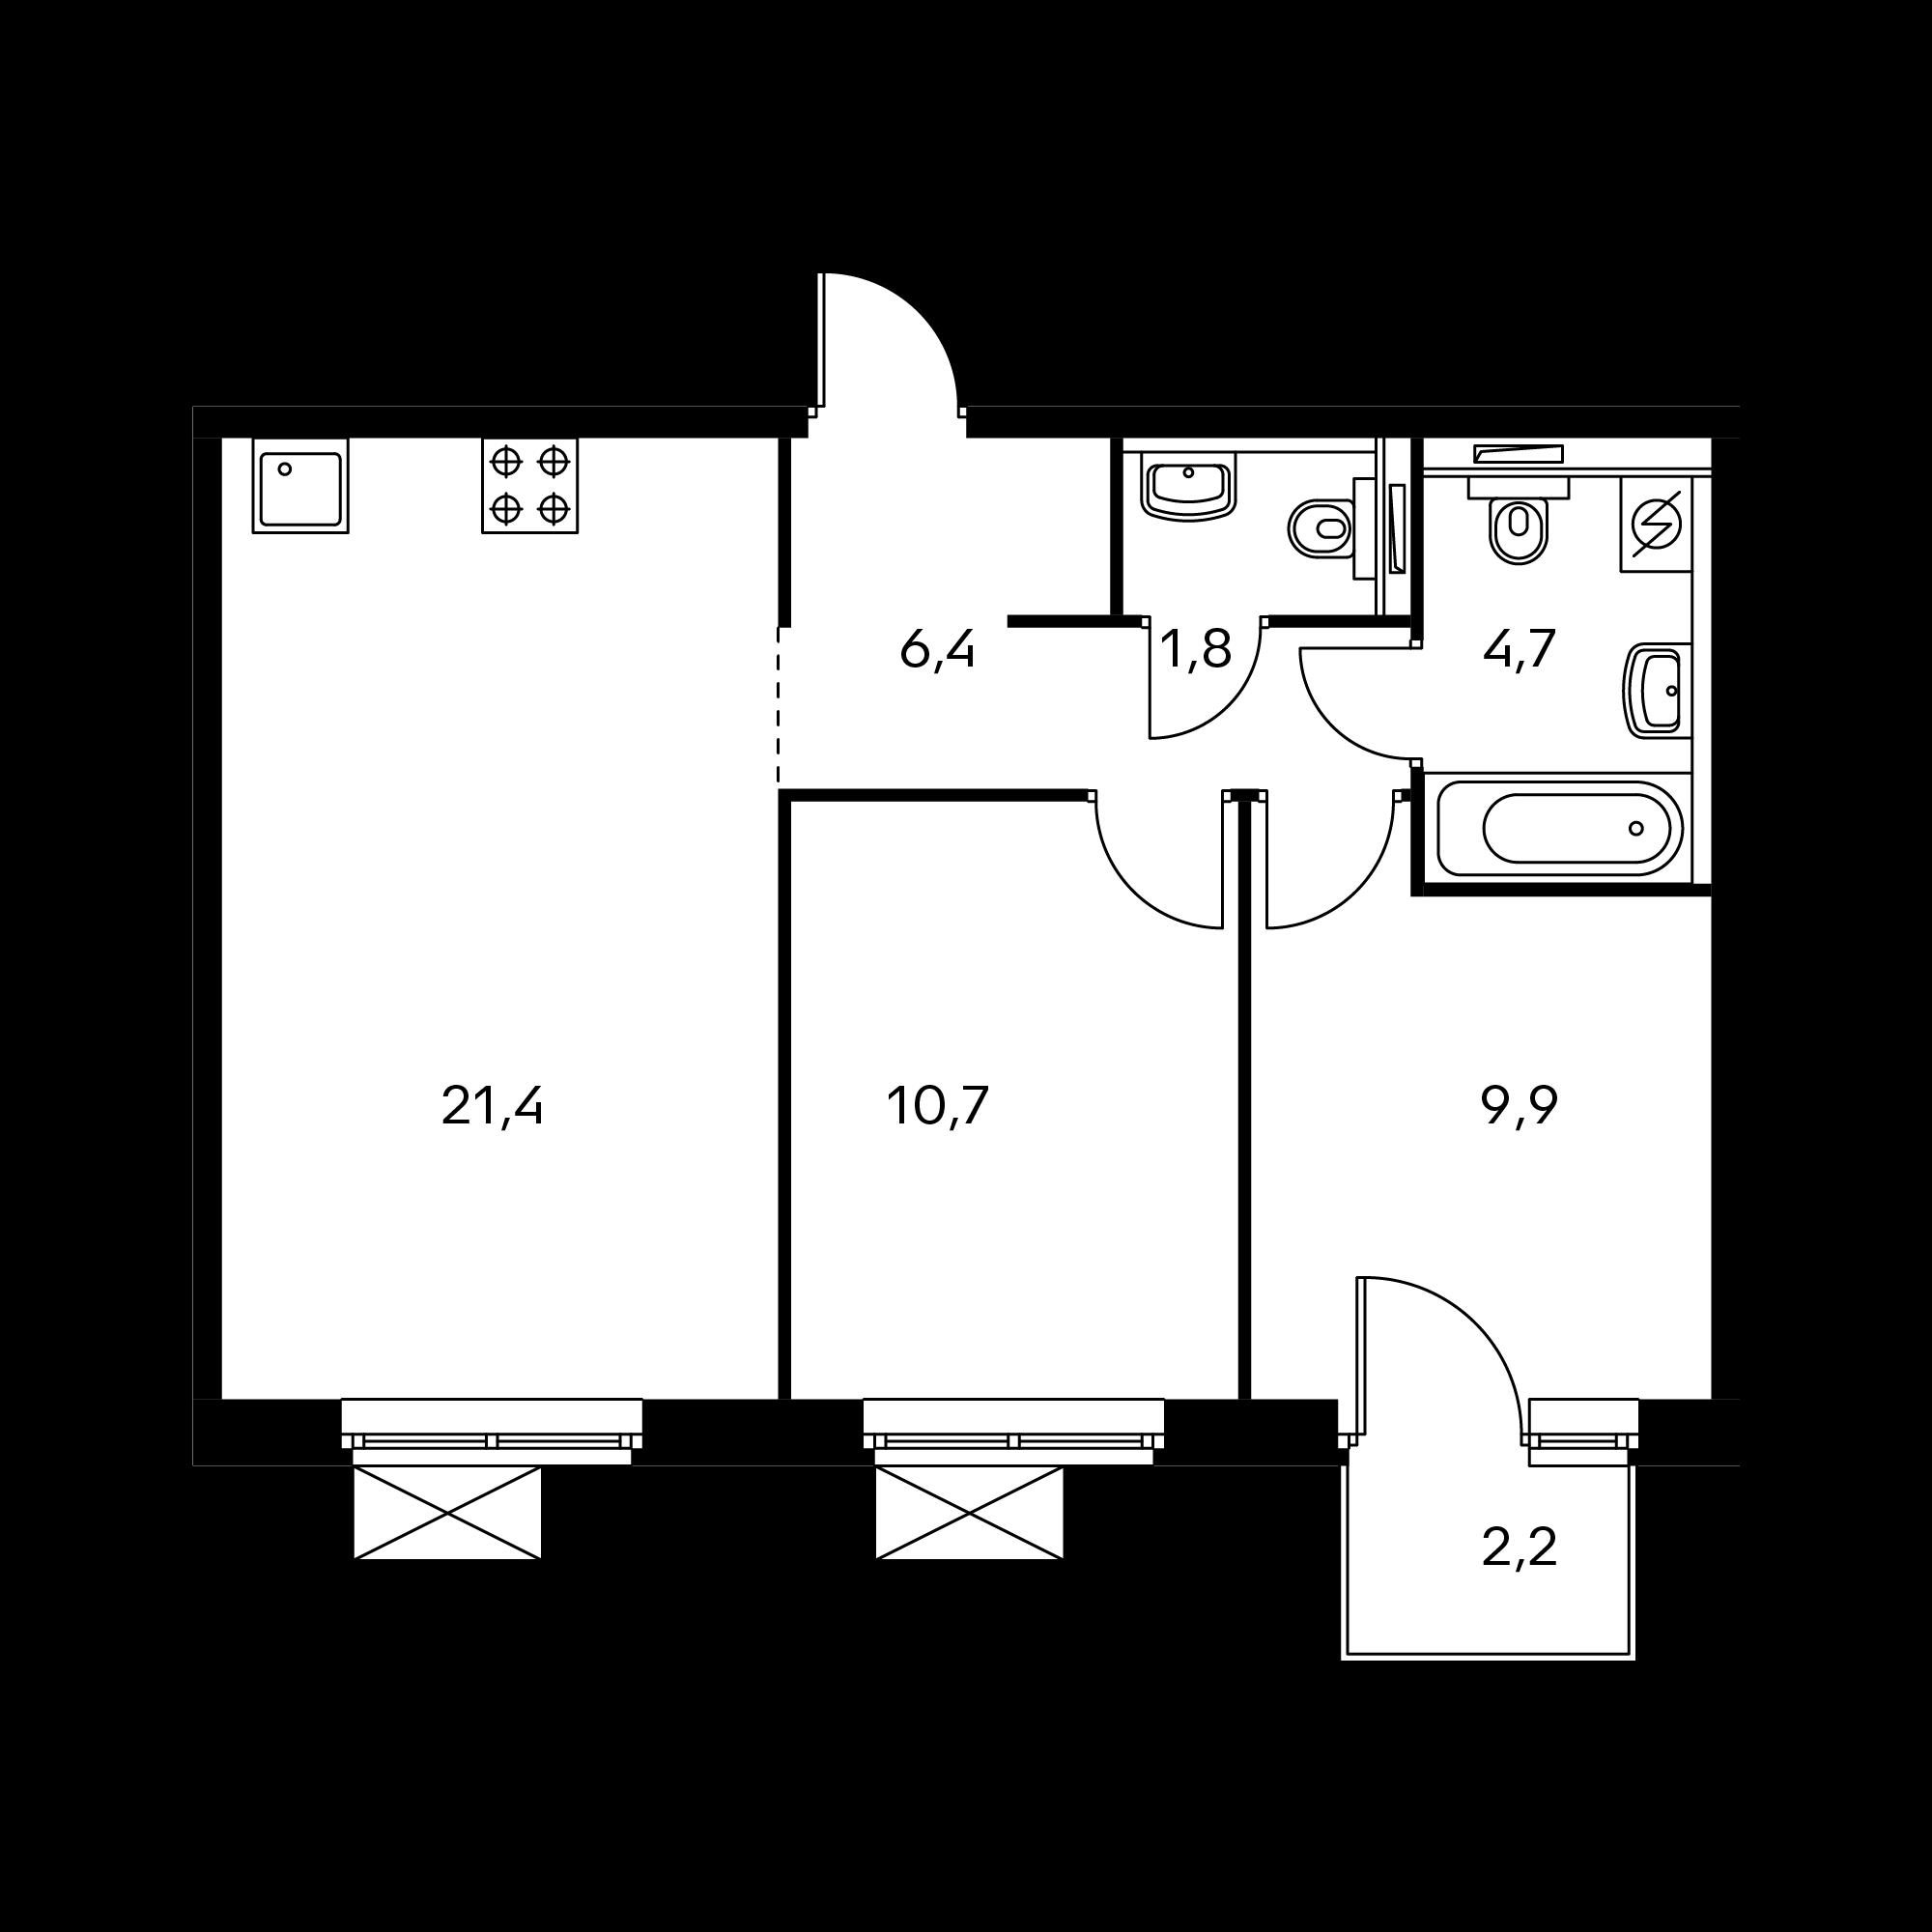 2ES9_9.6-1_B(2,2)_2